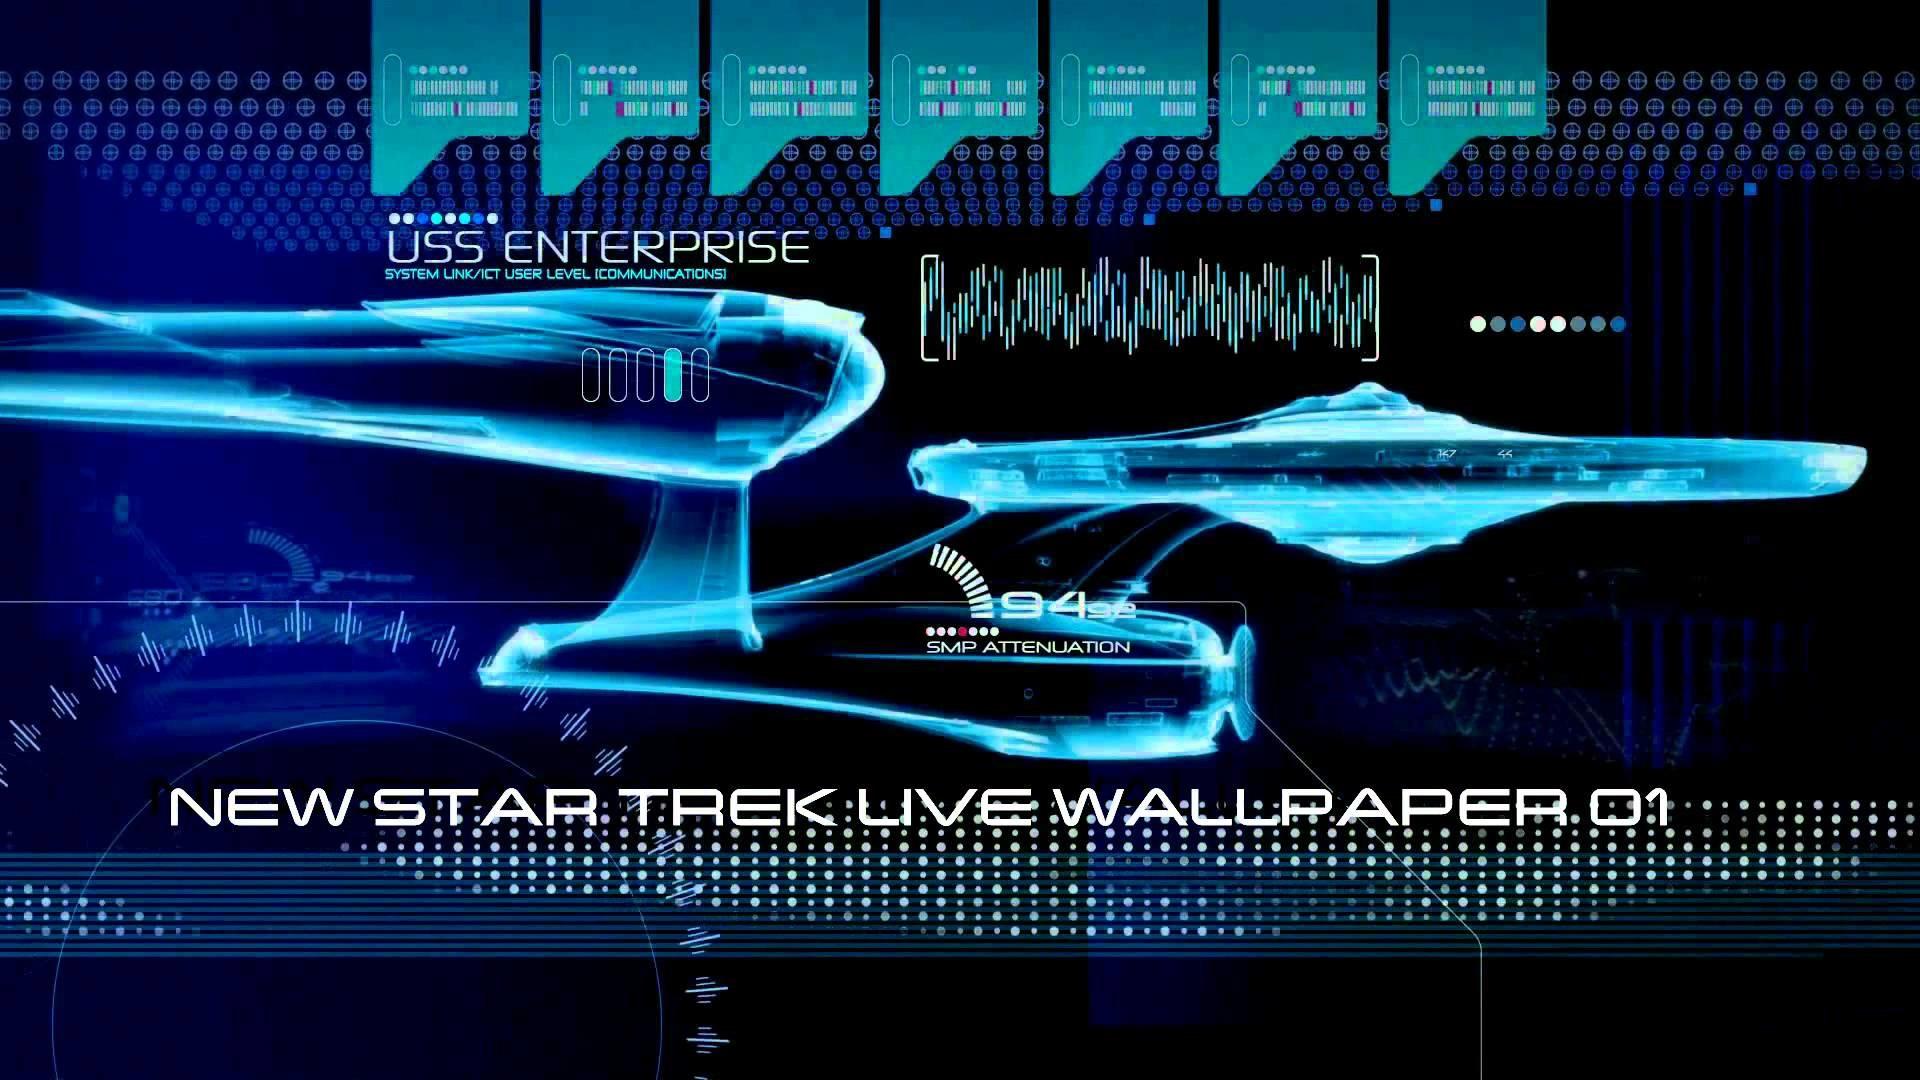 Star Trek Computer Desktop Wallpaper